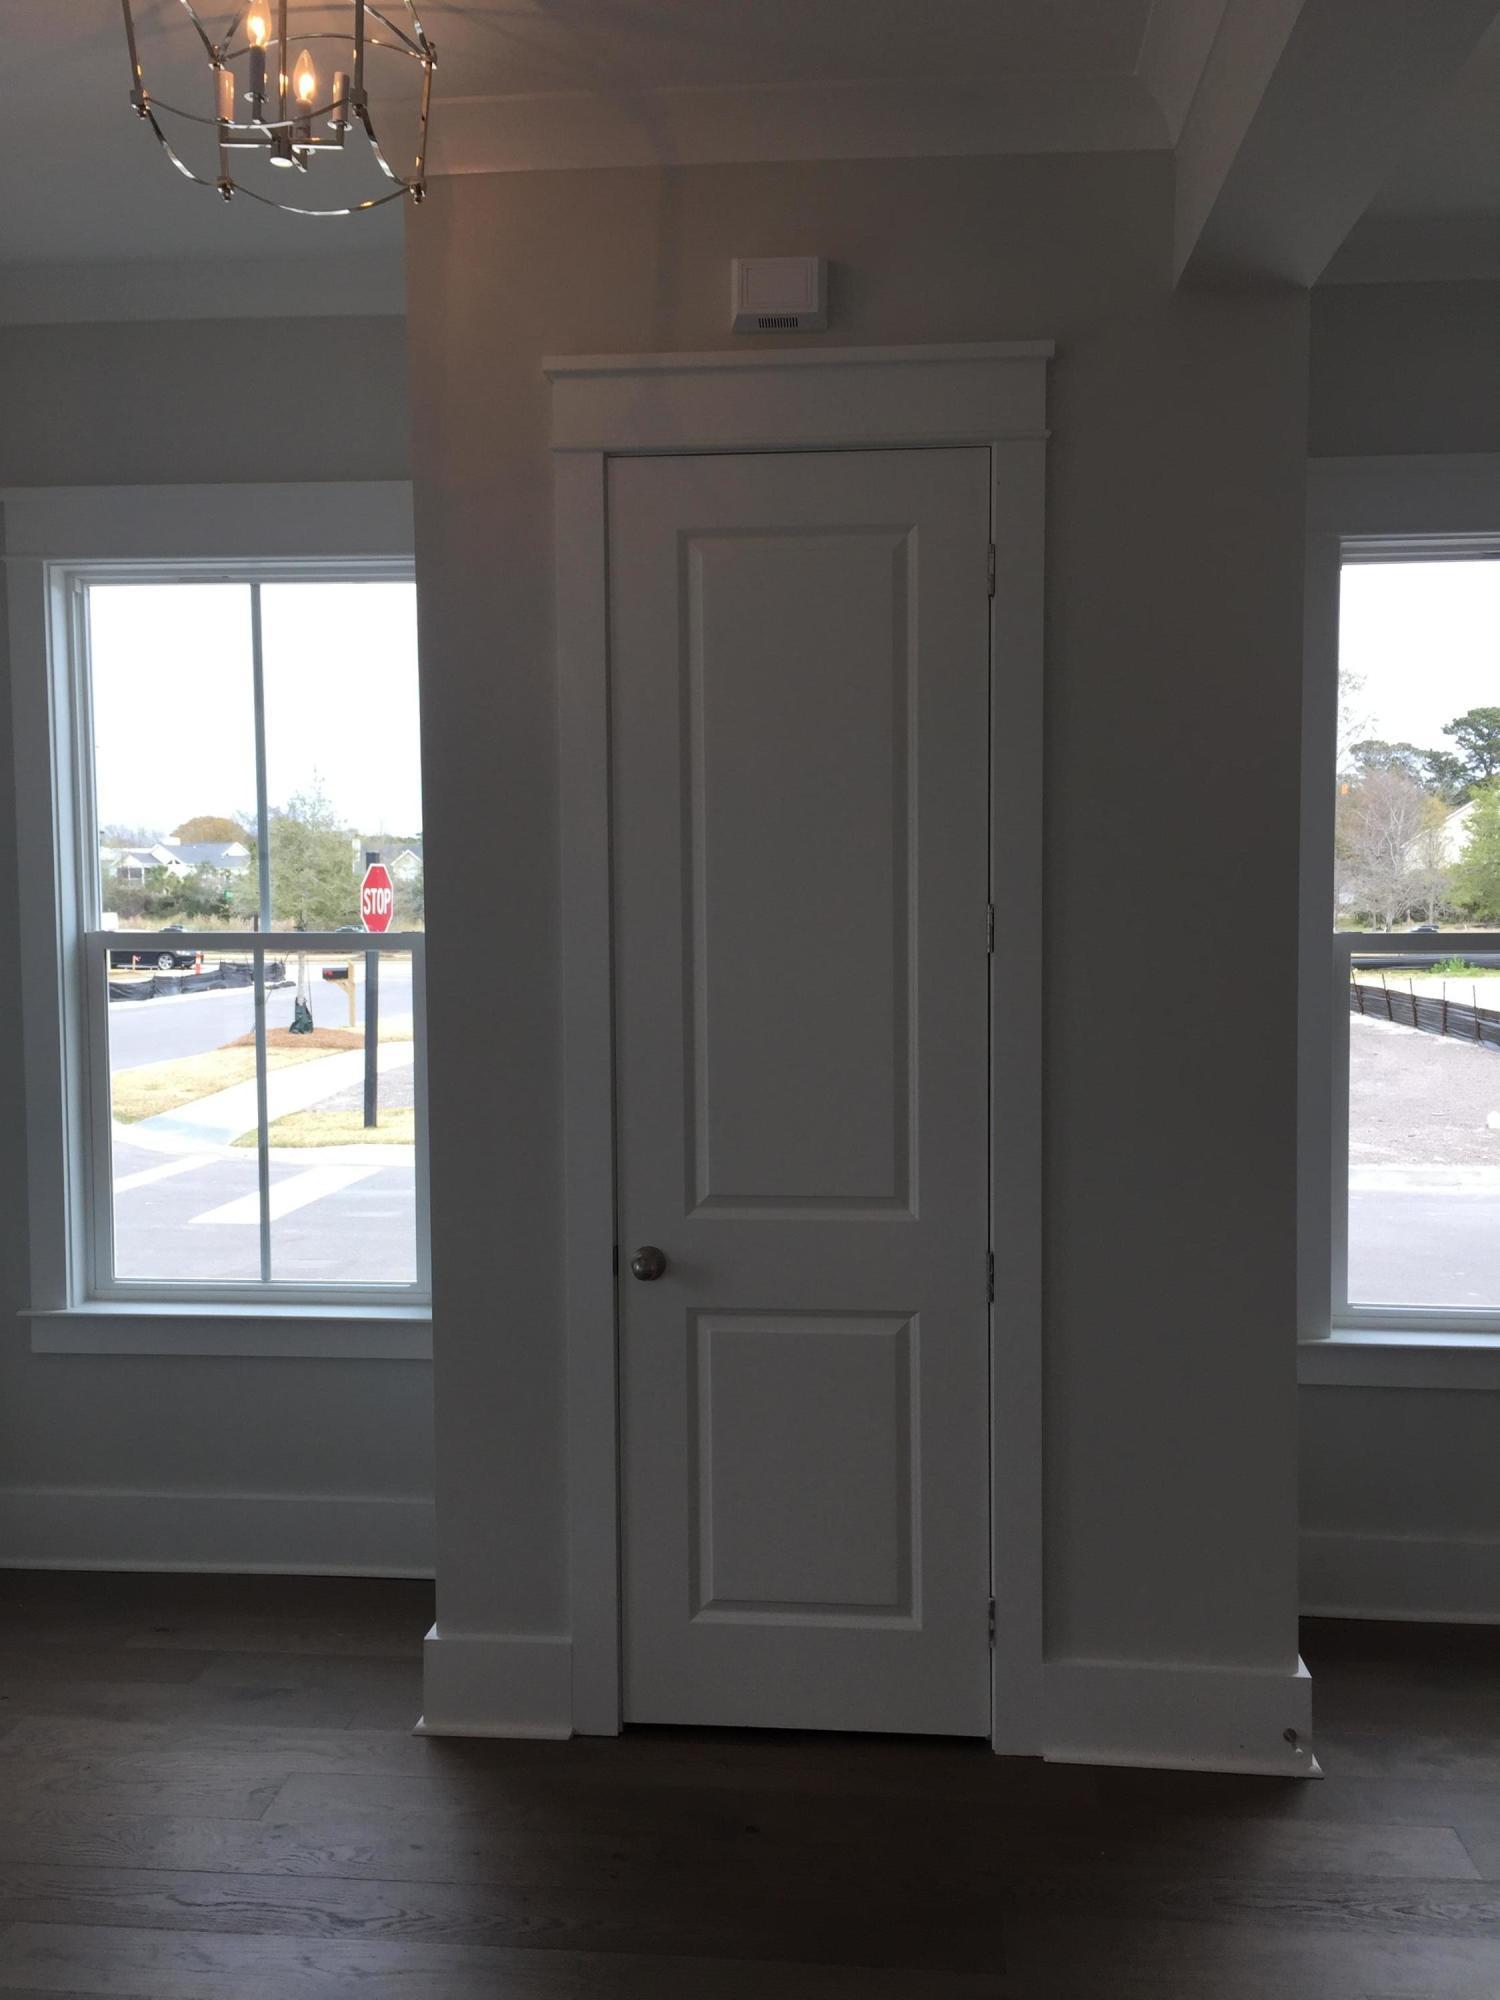 Midtown Homes For Sale - 1561 Kepley, Mount Pleasant, SC - 23